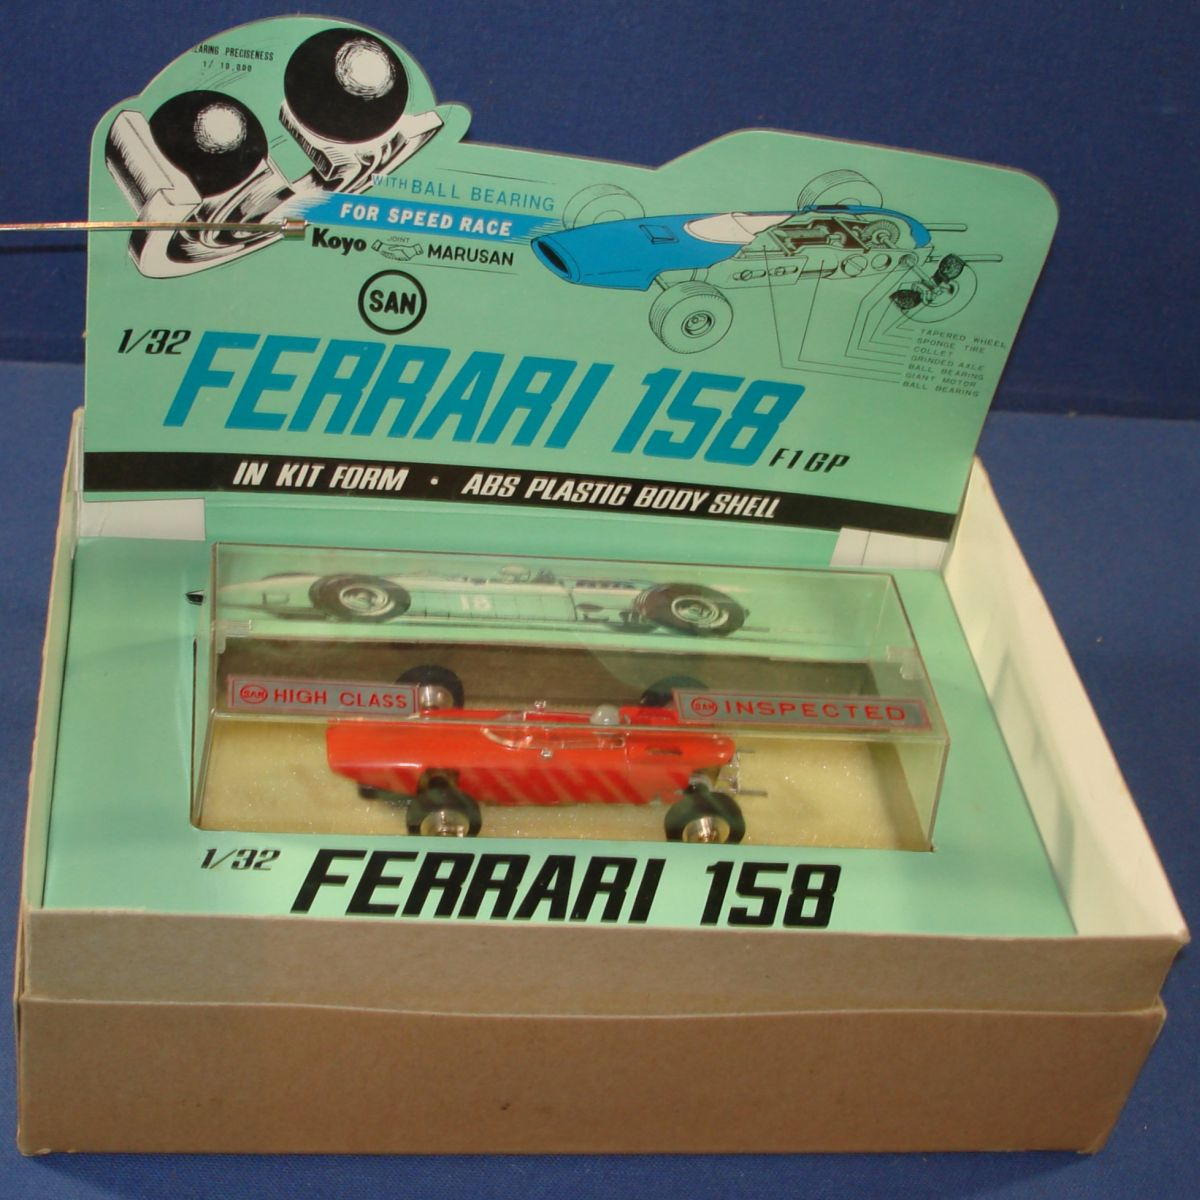 Marusan 1/32 Formula 1 Ferrari MIB Slot Car